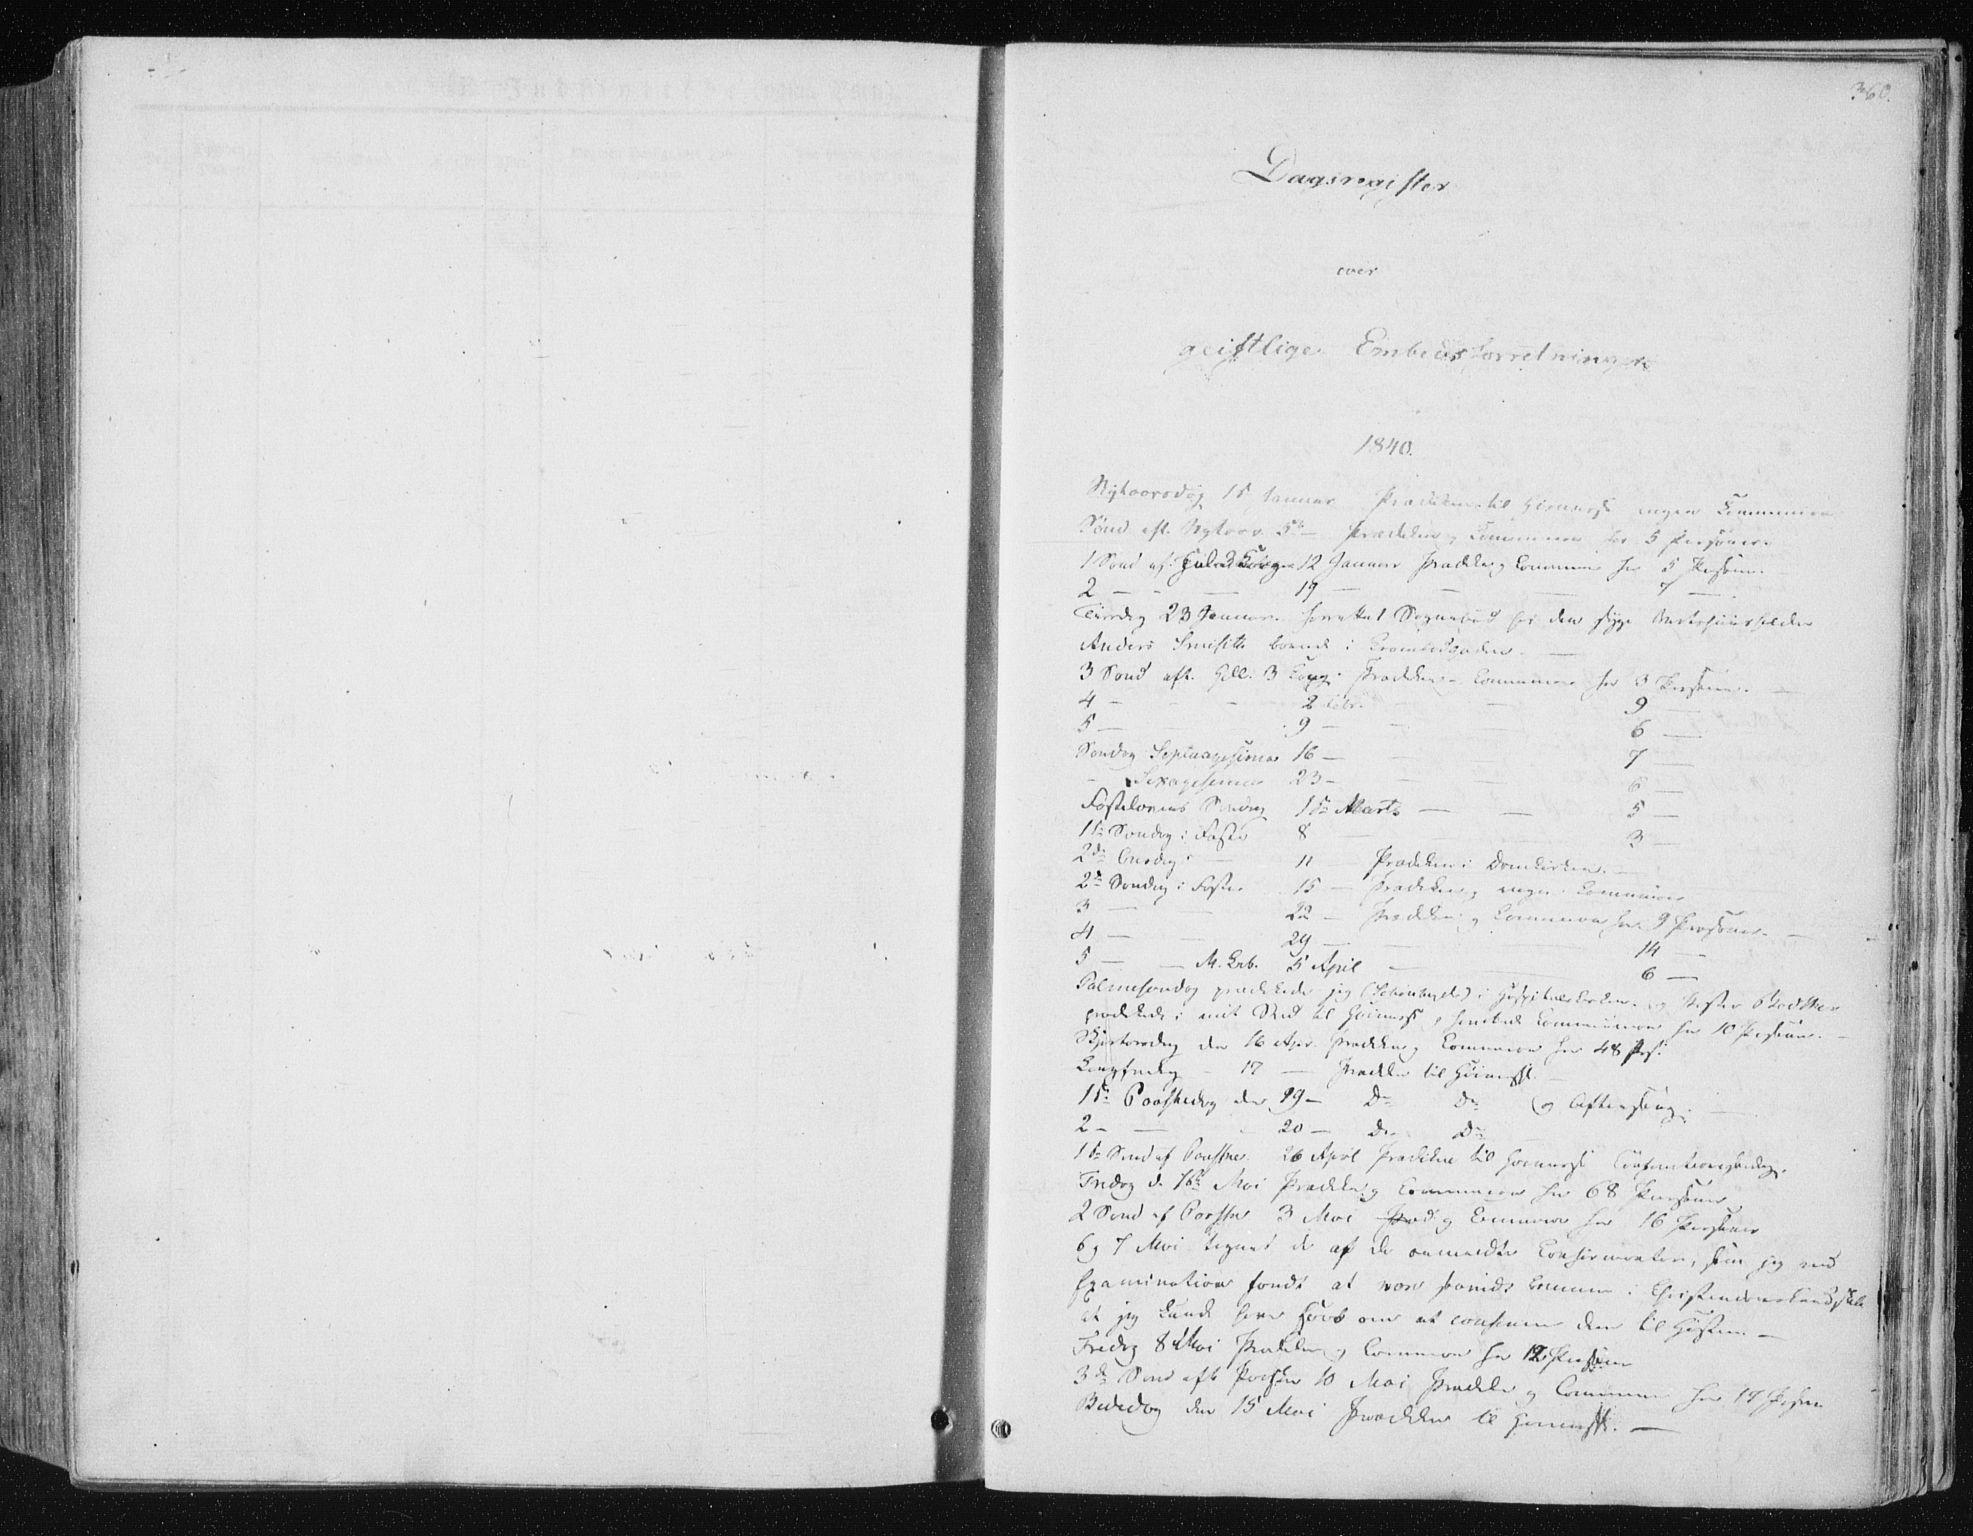 SAT, Ministerialprotokoller, klokkerbøker og fødselsregistre - Sør-Trøndelag, 602/L0110: Parish register (official) no. 602A08, 1840-1854, p. 360